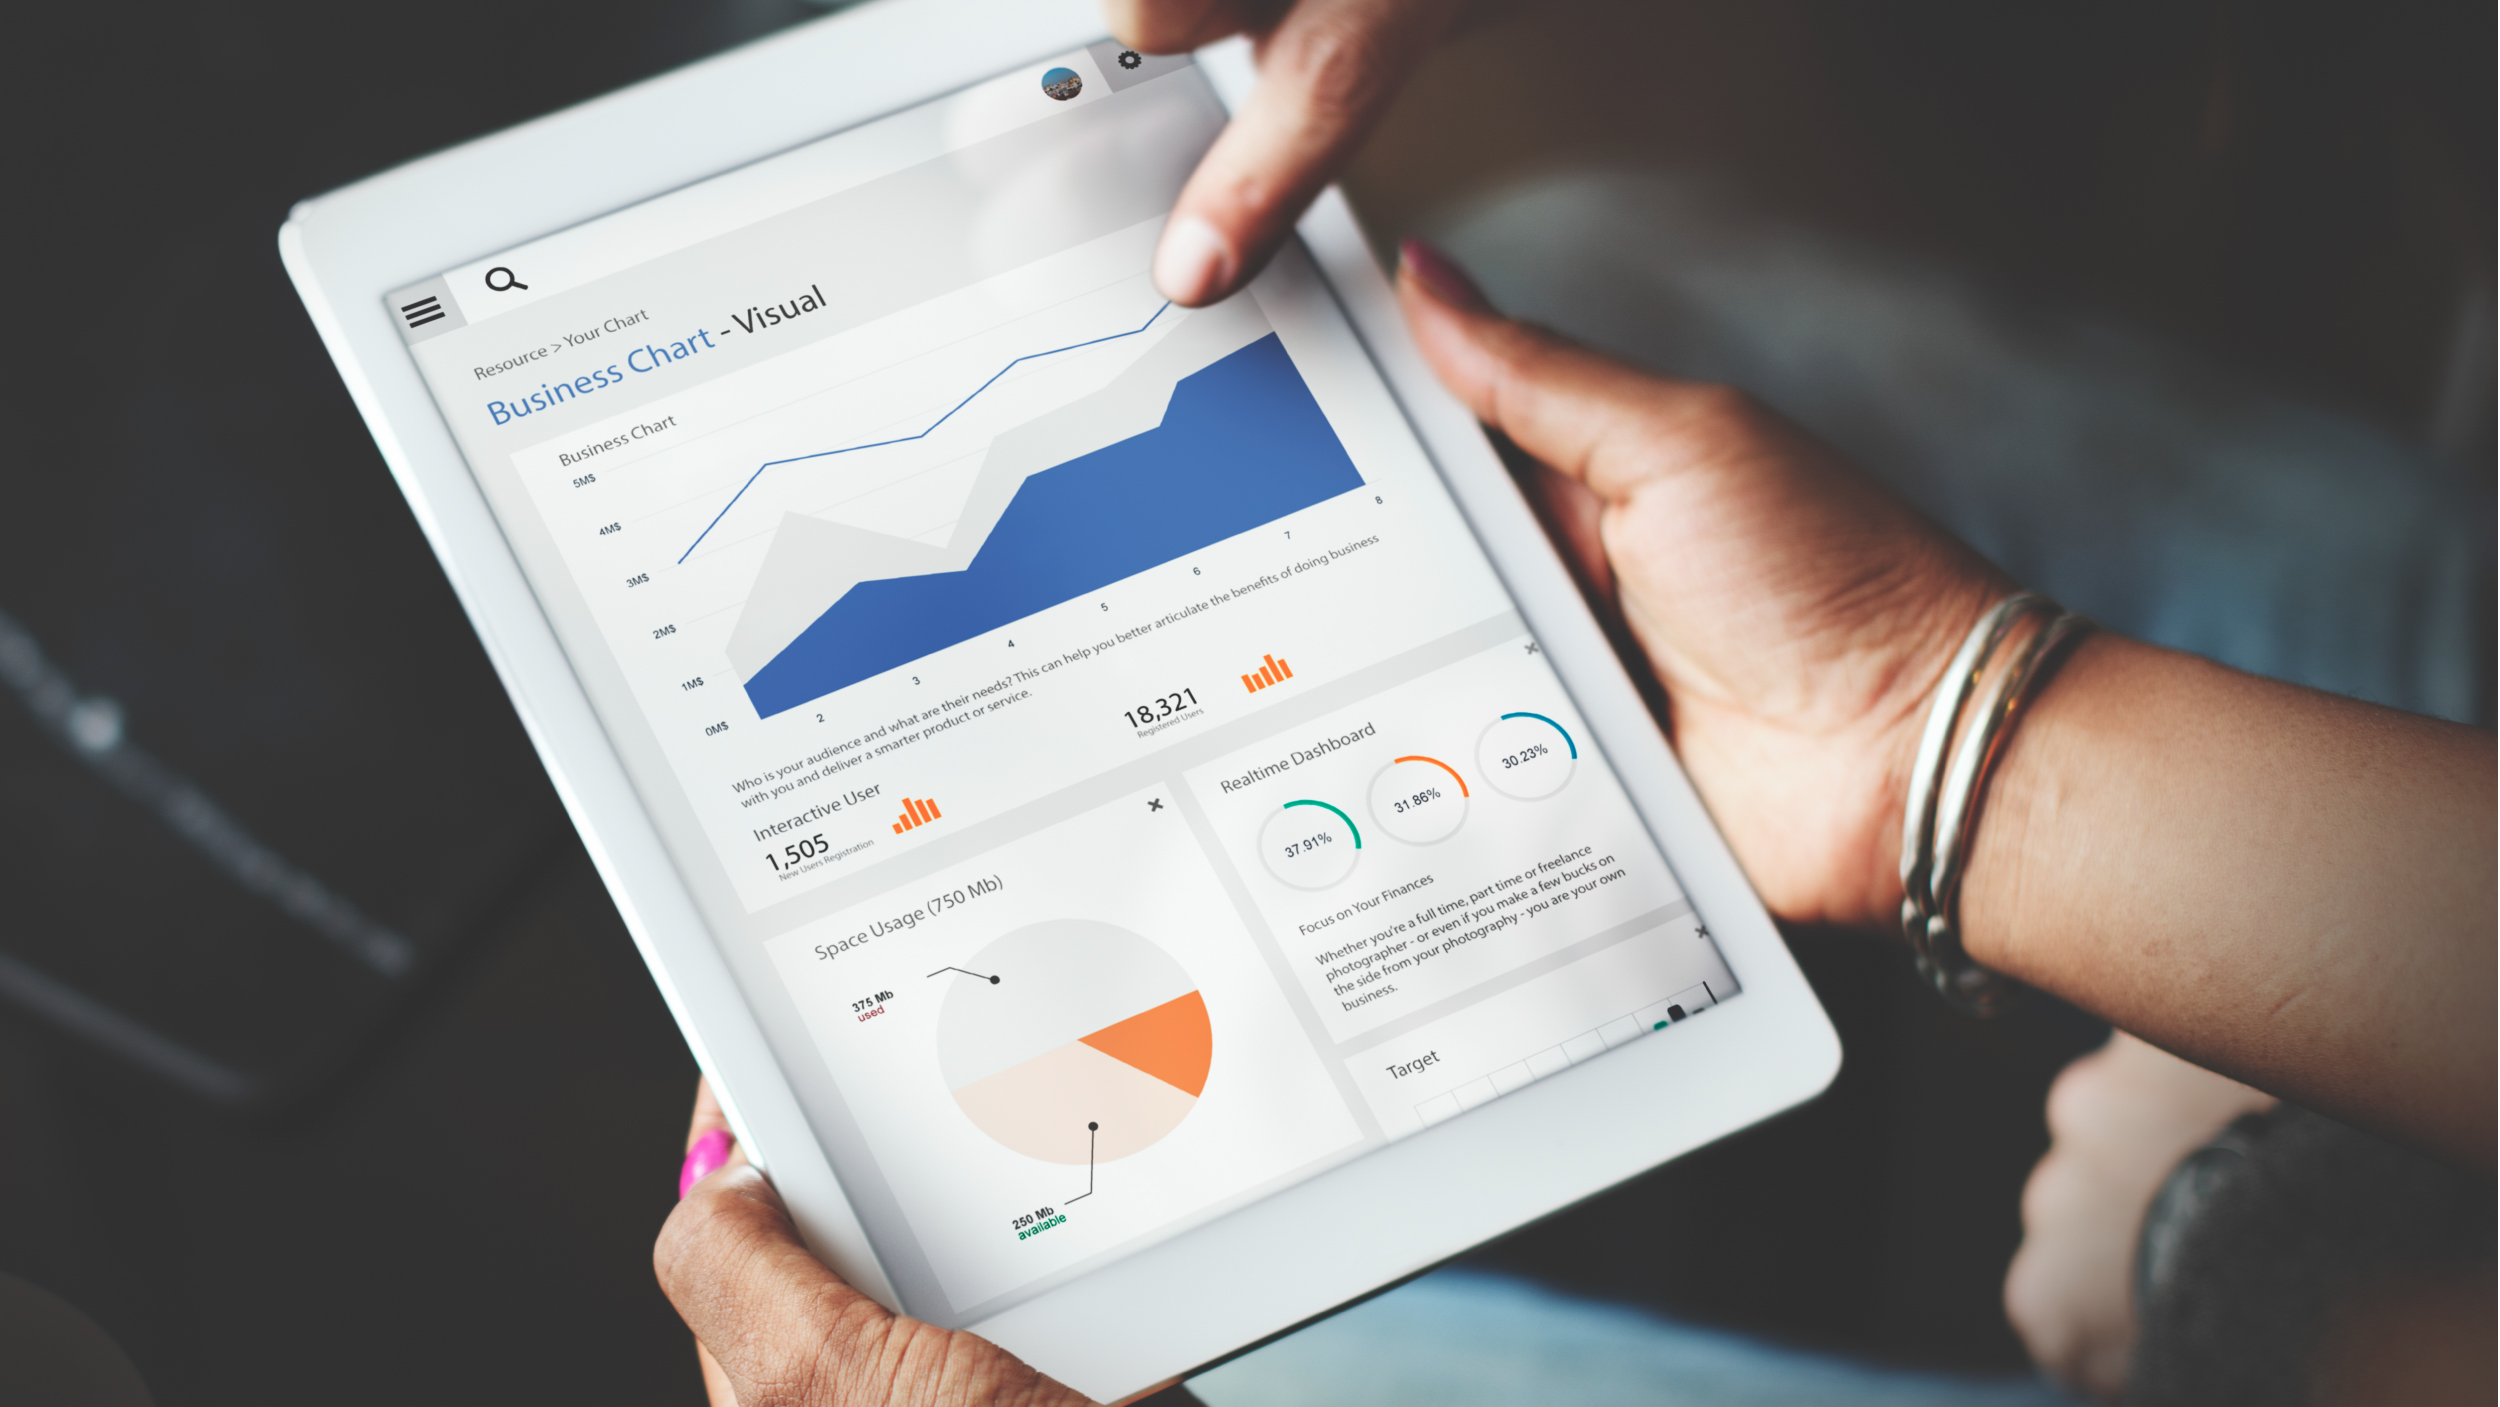 KPI Dashboard Overview | Botkeeper